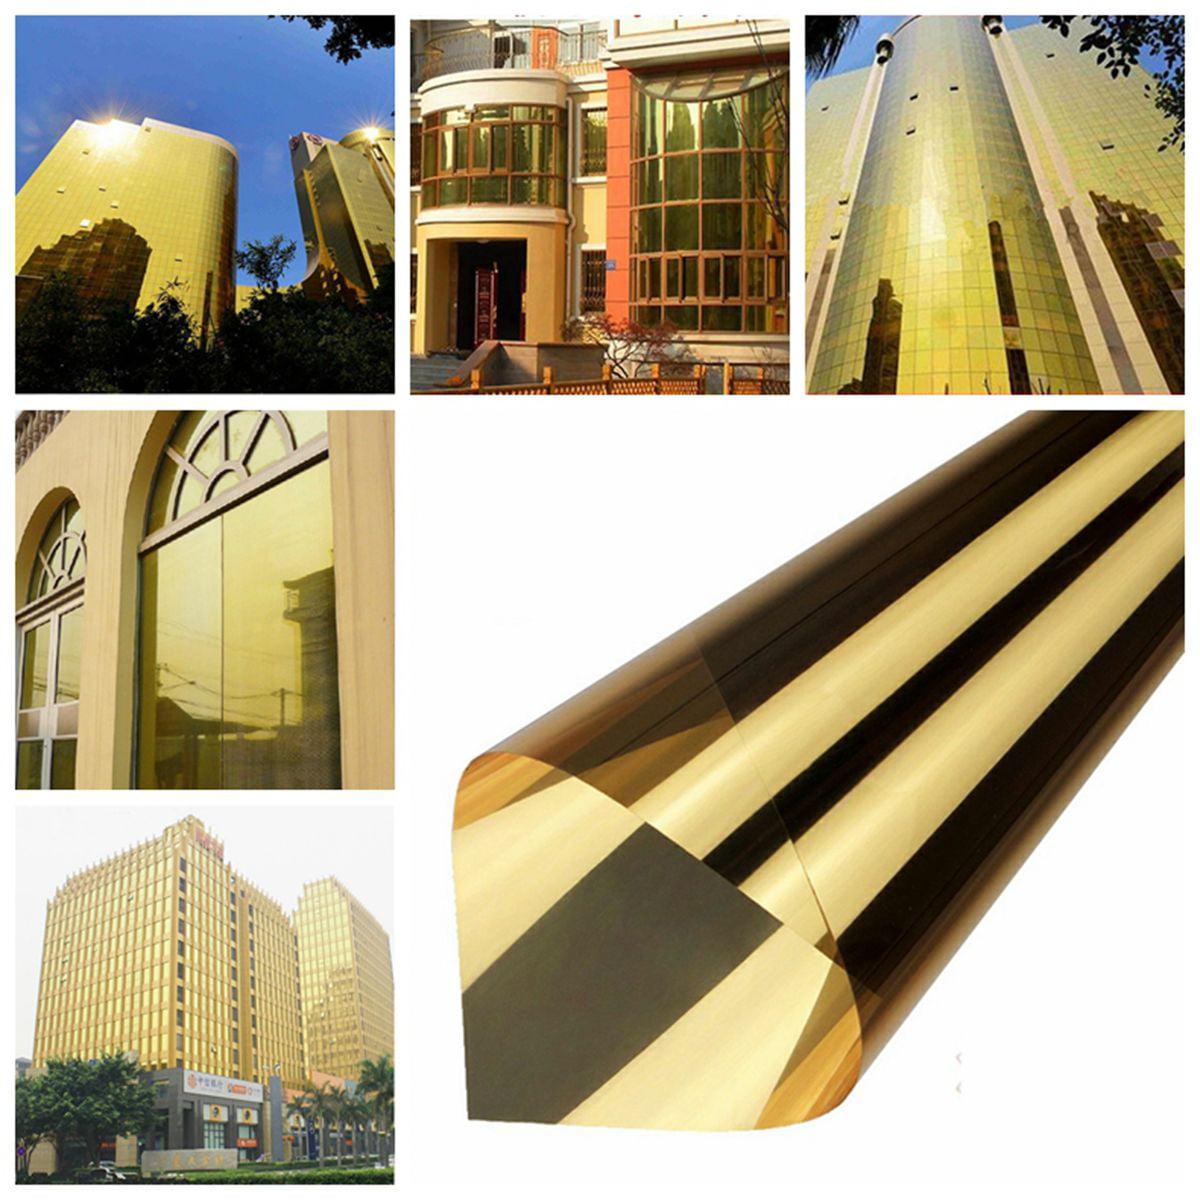 "Elfeland 19.6""x118"" 15% VLT Solar Reflective Window Film Insulation Stickers One Way Mirror"